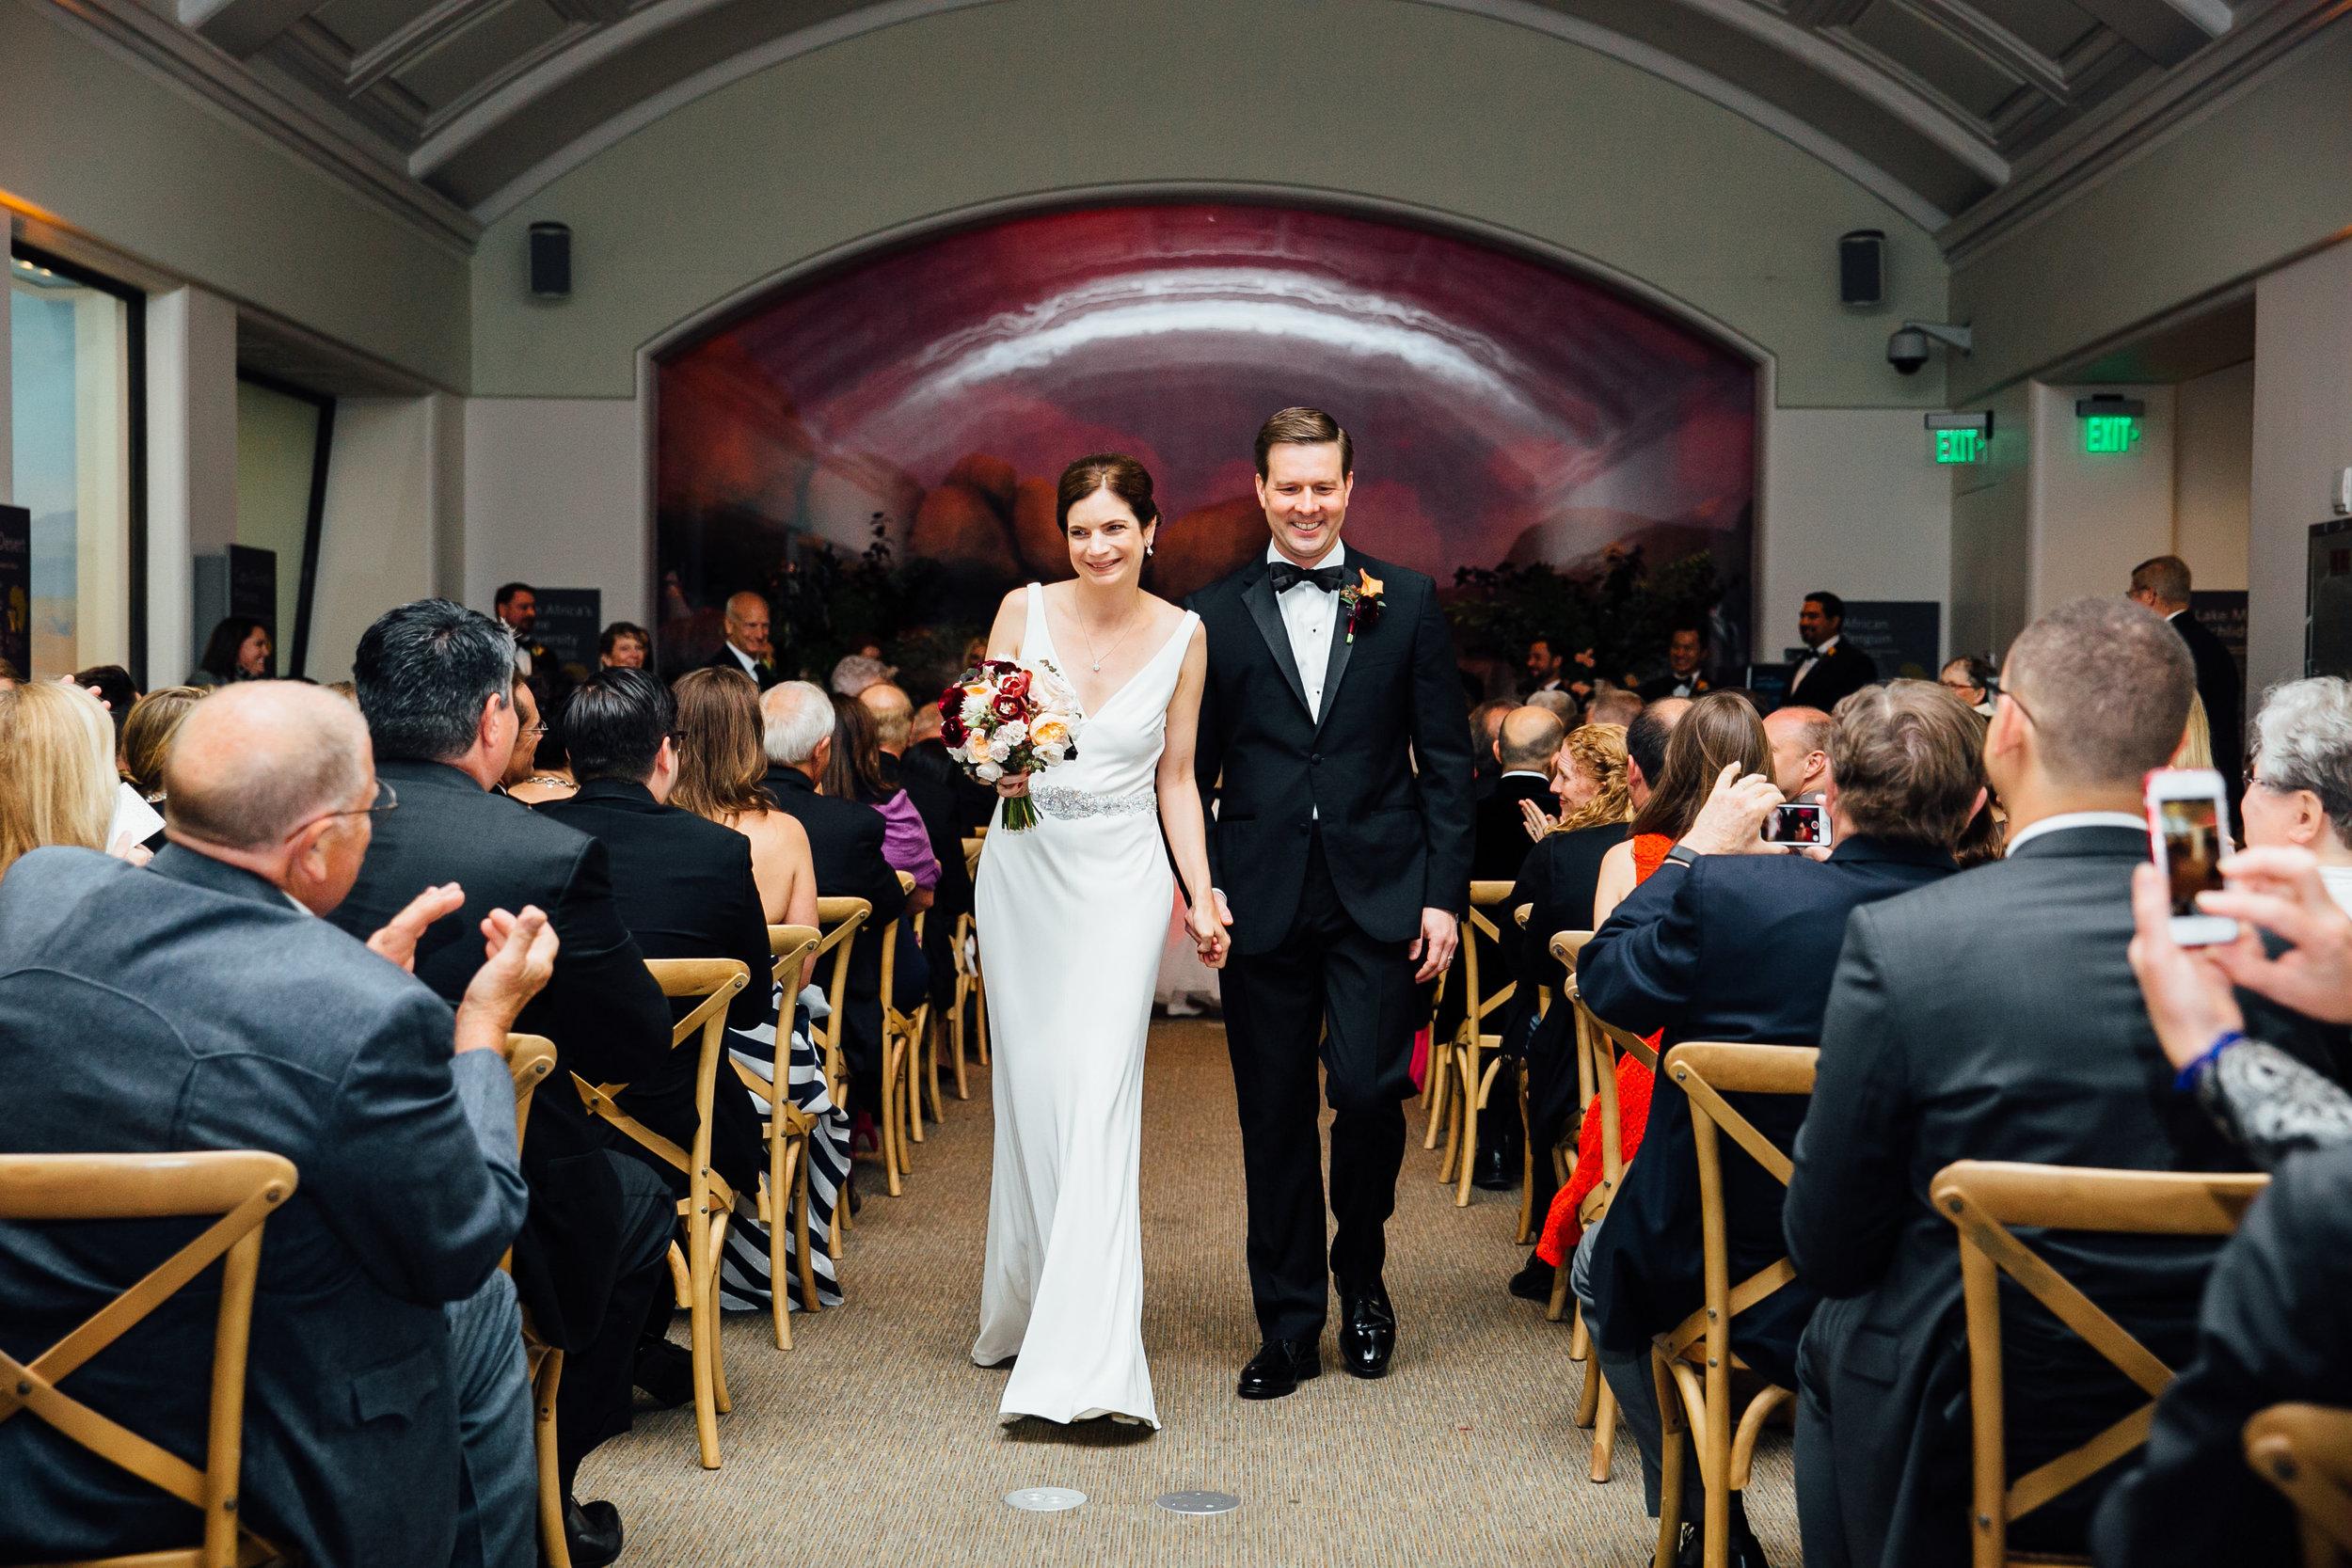 Wedding_KathleenMichael_Ceremony-214.jpg